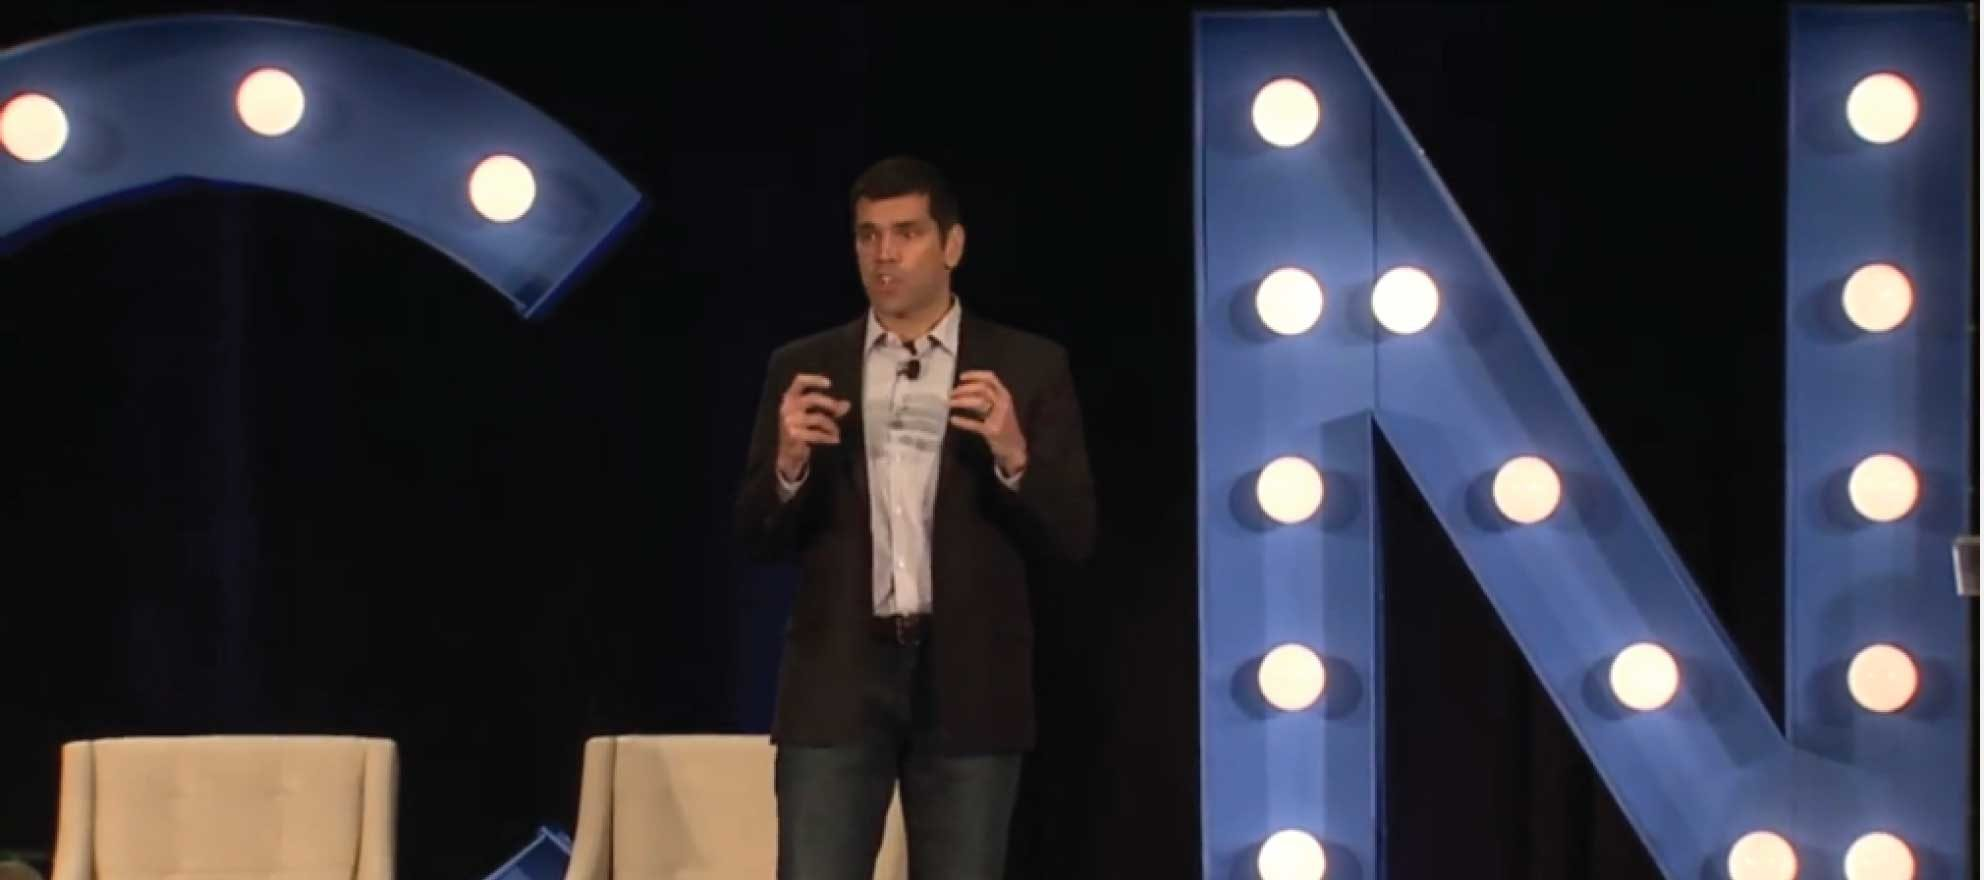 Bill Brown: 'We believe 3-D technology will revolutionize real estate'